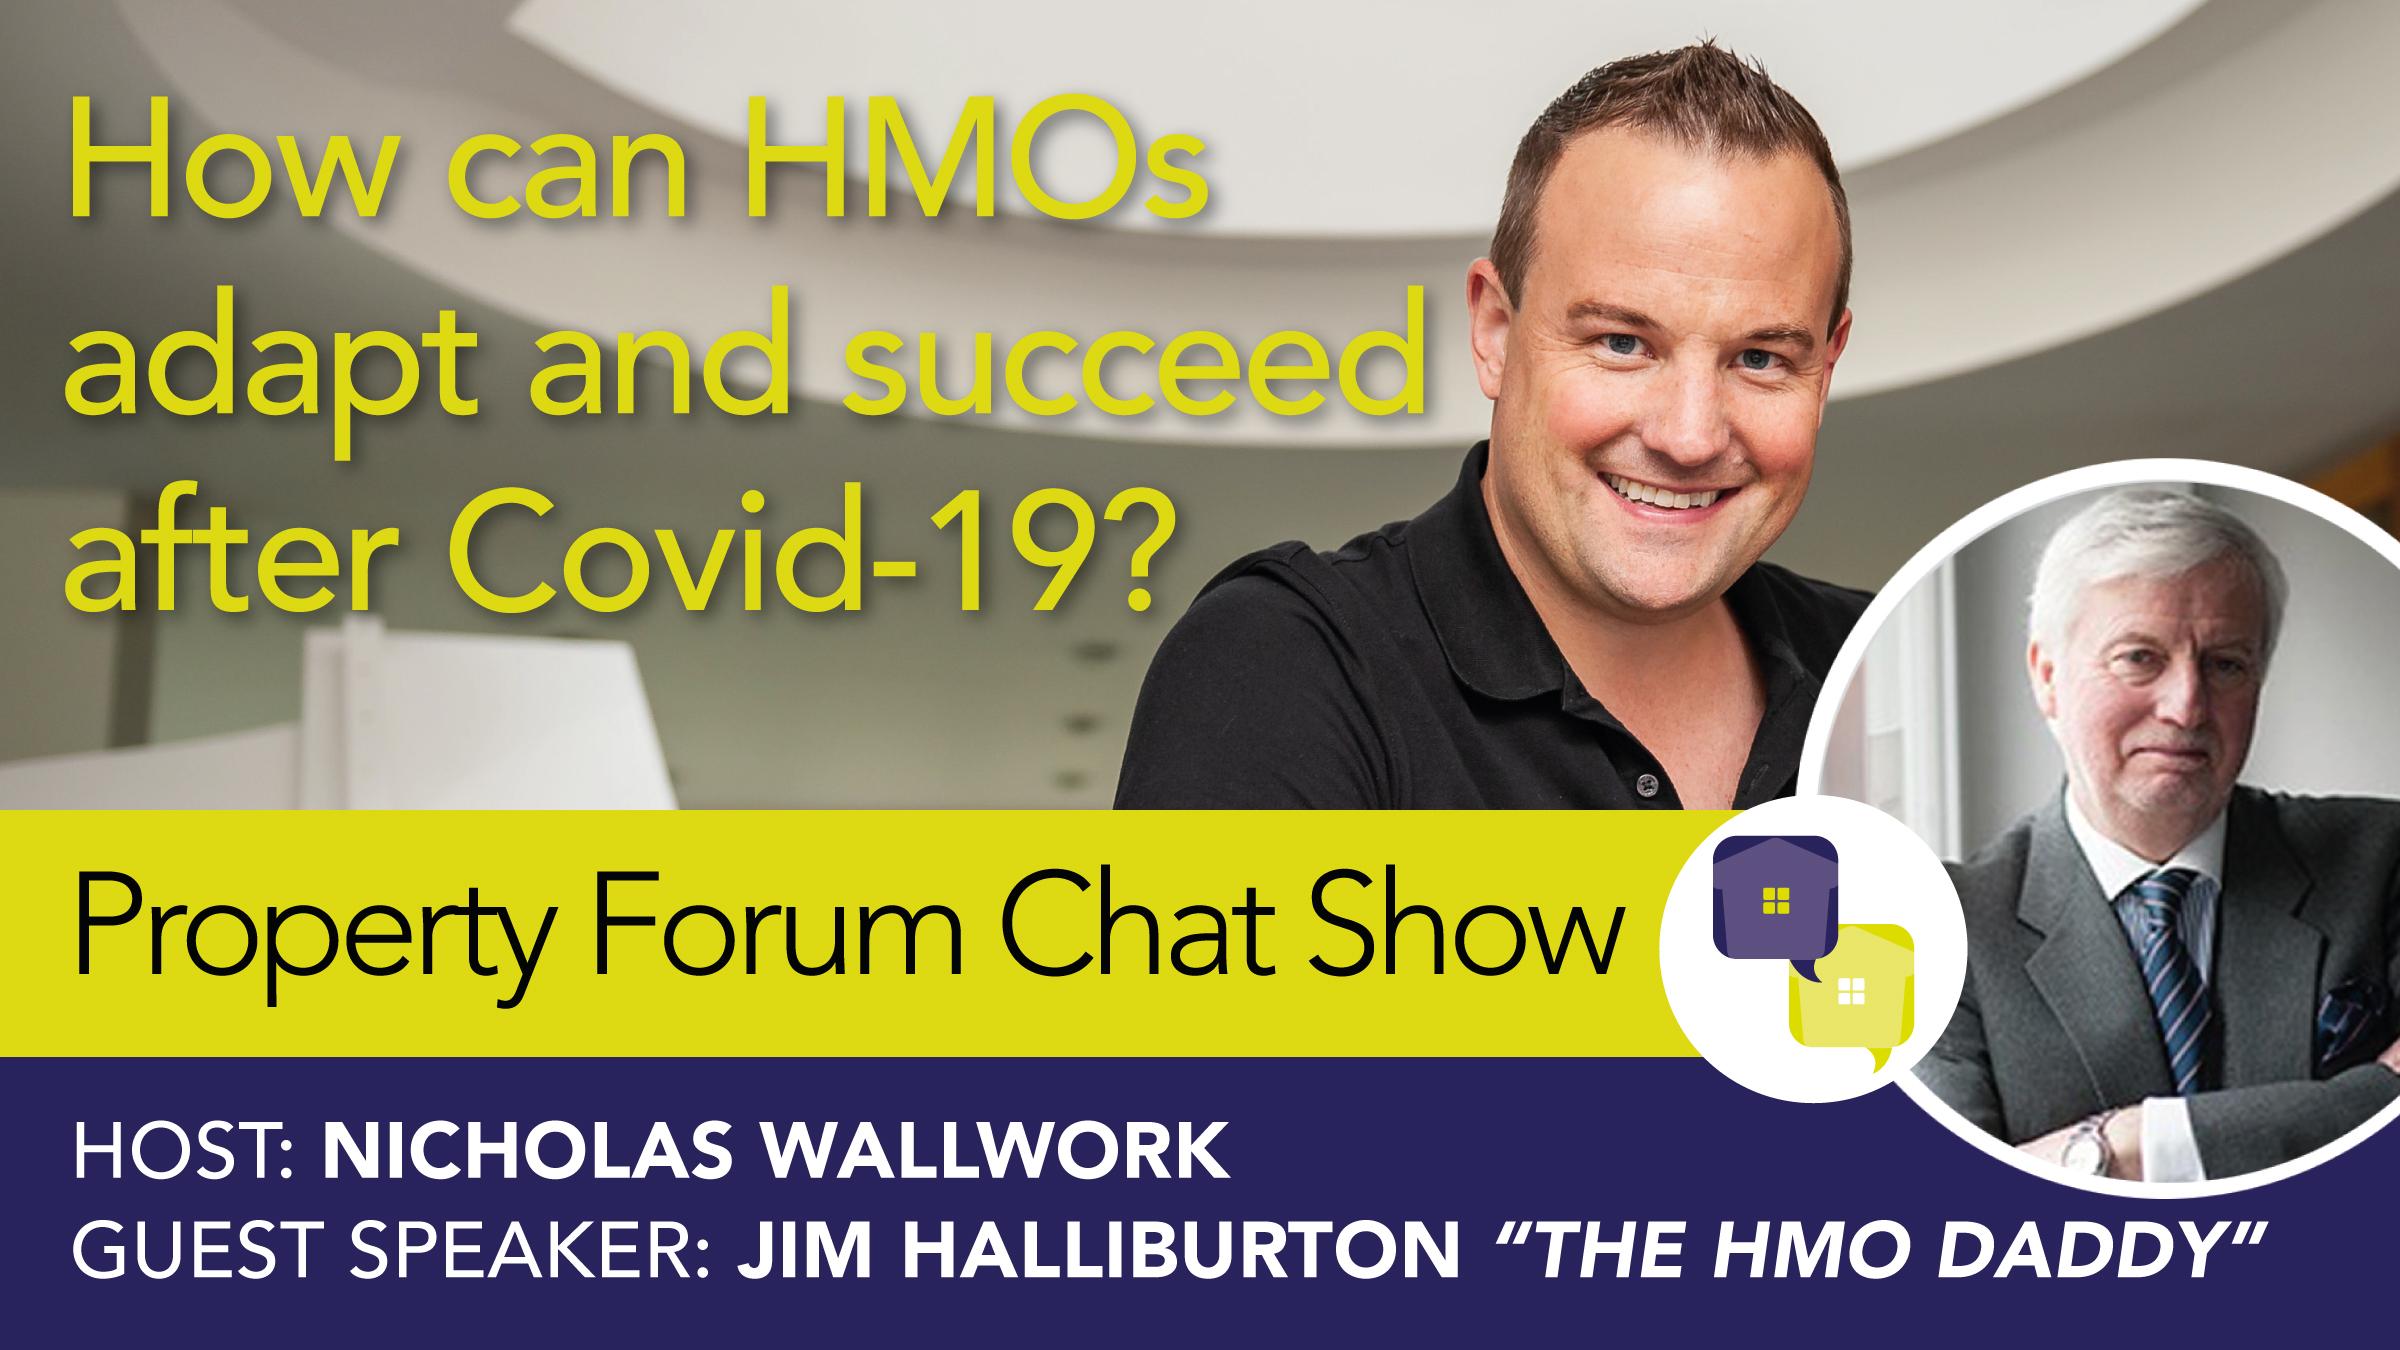 Jim Haliburton appears on chat show